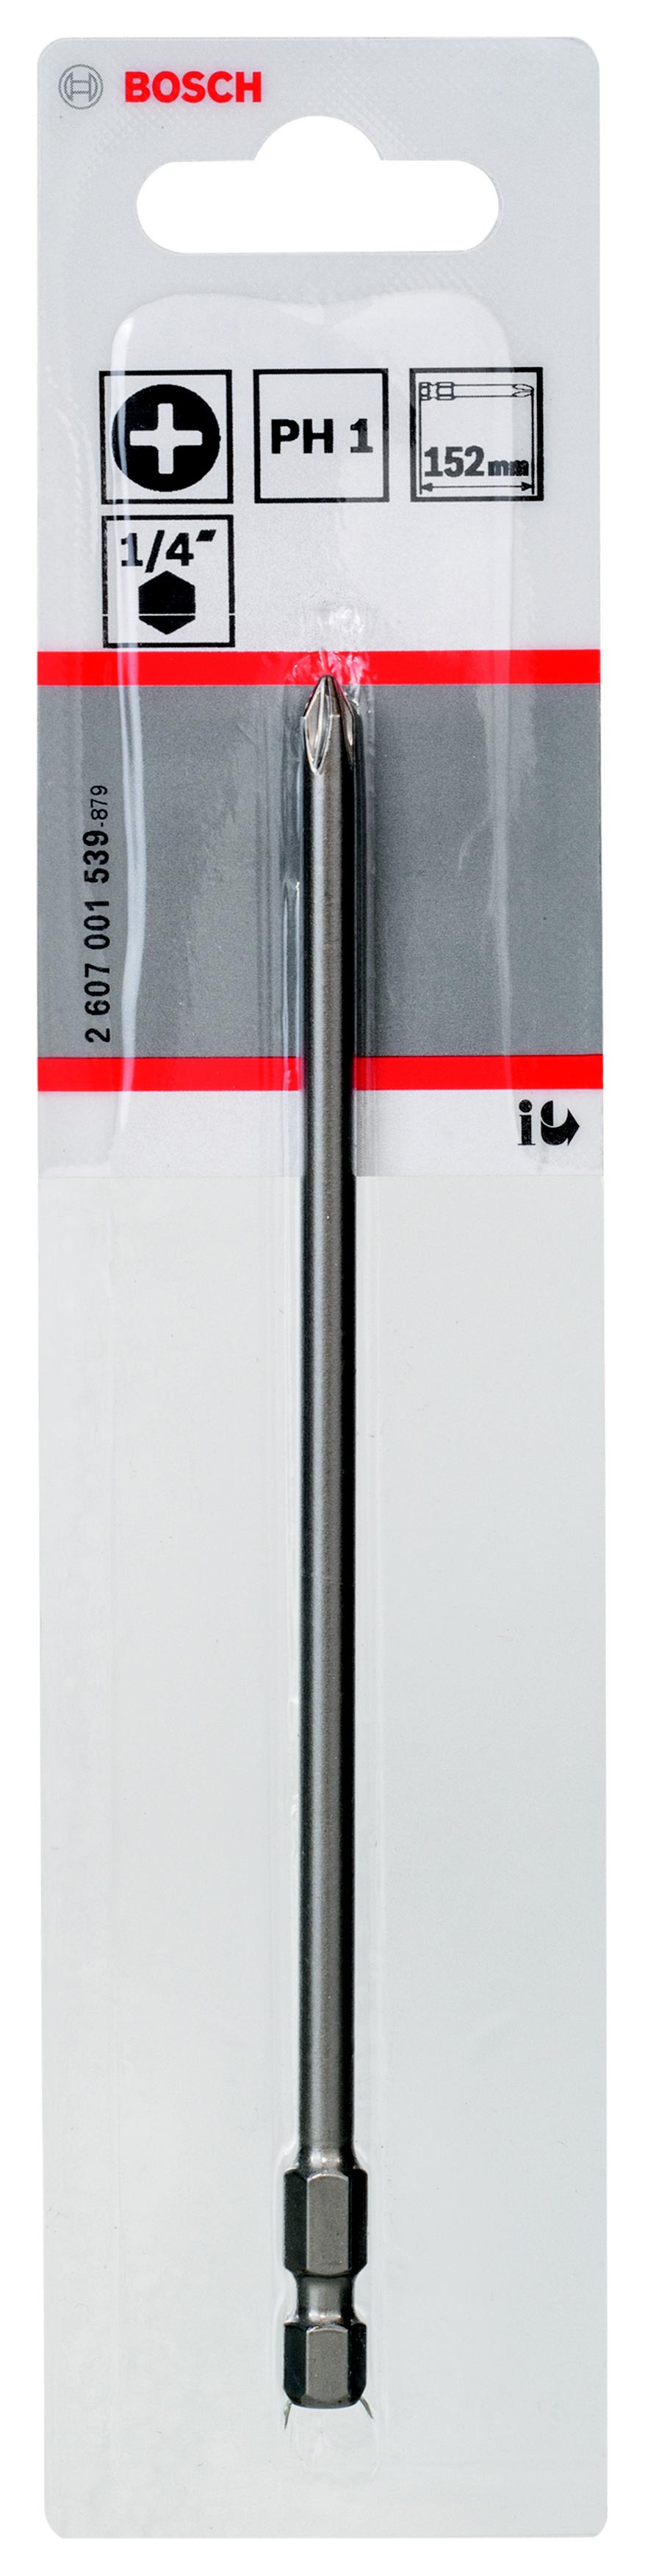 Бита Bosch Extra-hart ph1 152 мм, 1 шт. (2.607.001.539) джемпер j hart & bros j hart & bros jh001emxju83